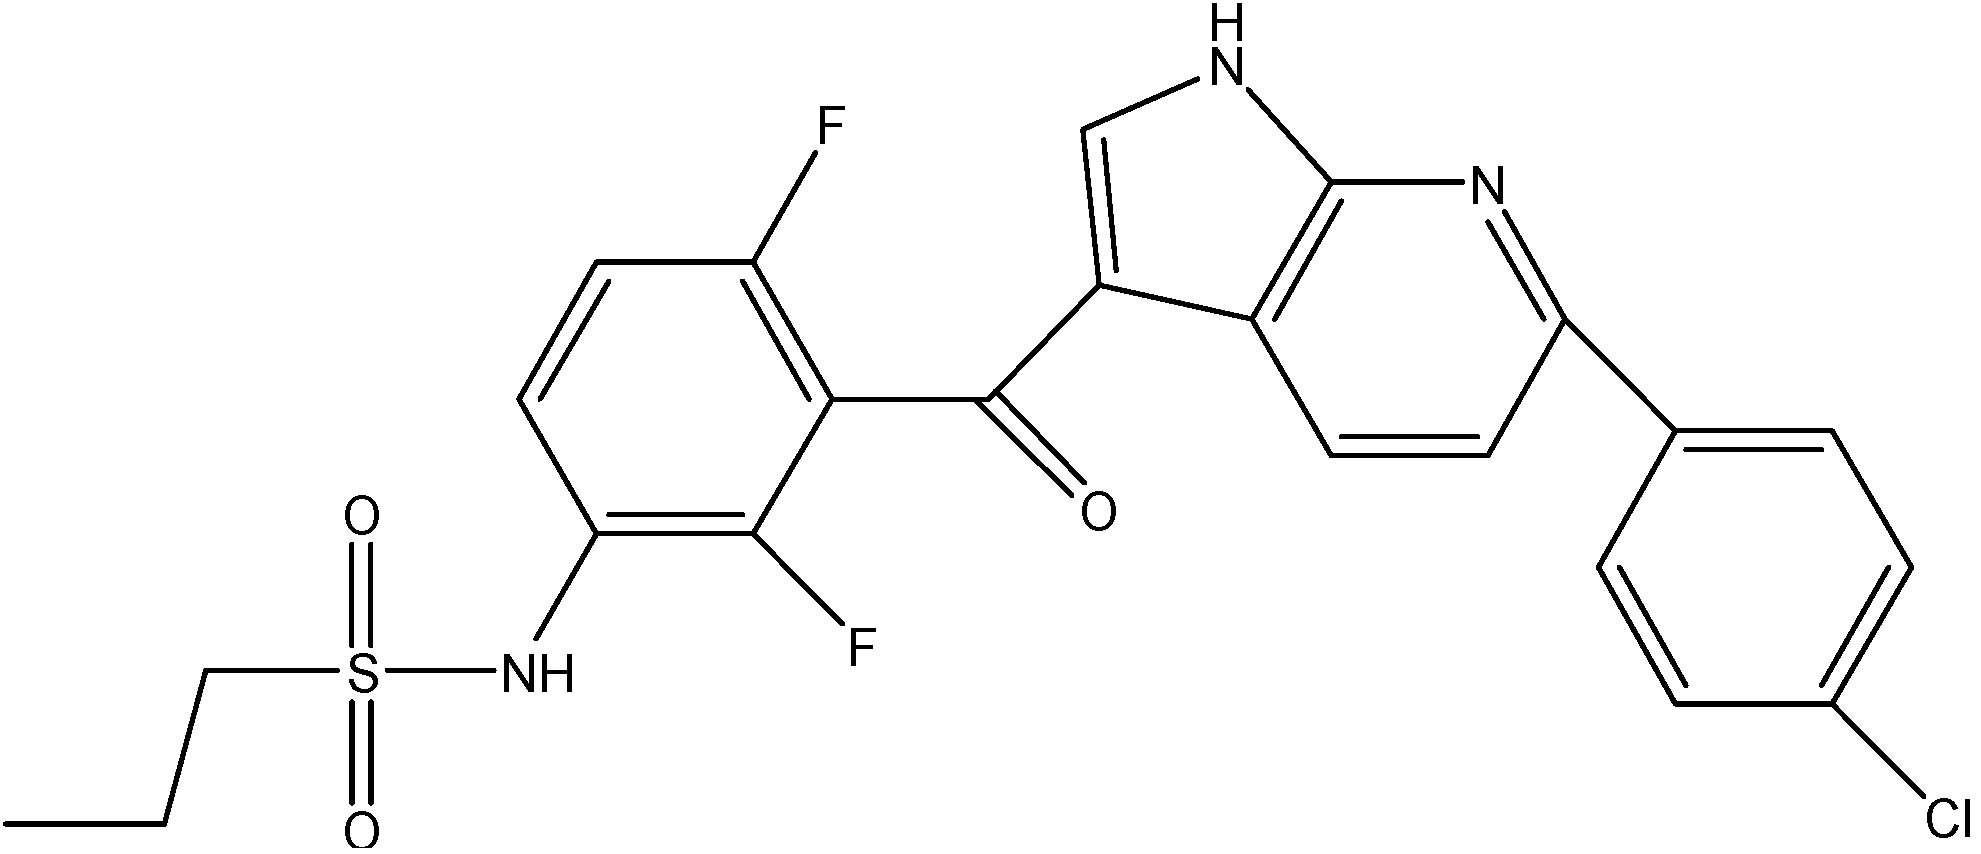 Molecules | Free Full-Text | Tyrosine Kinase Inhibitors as ...